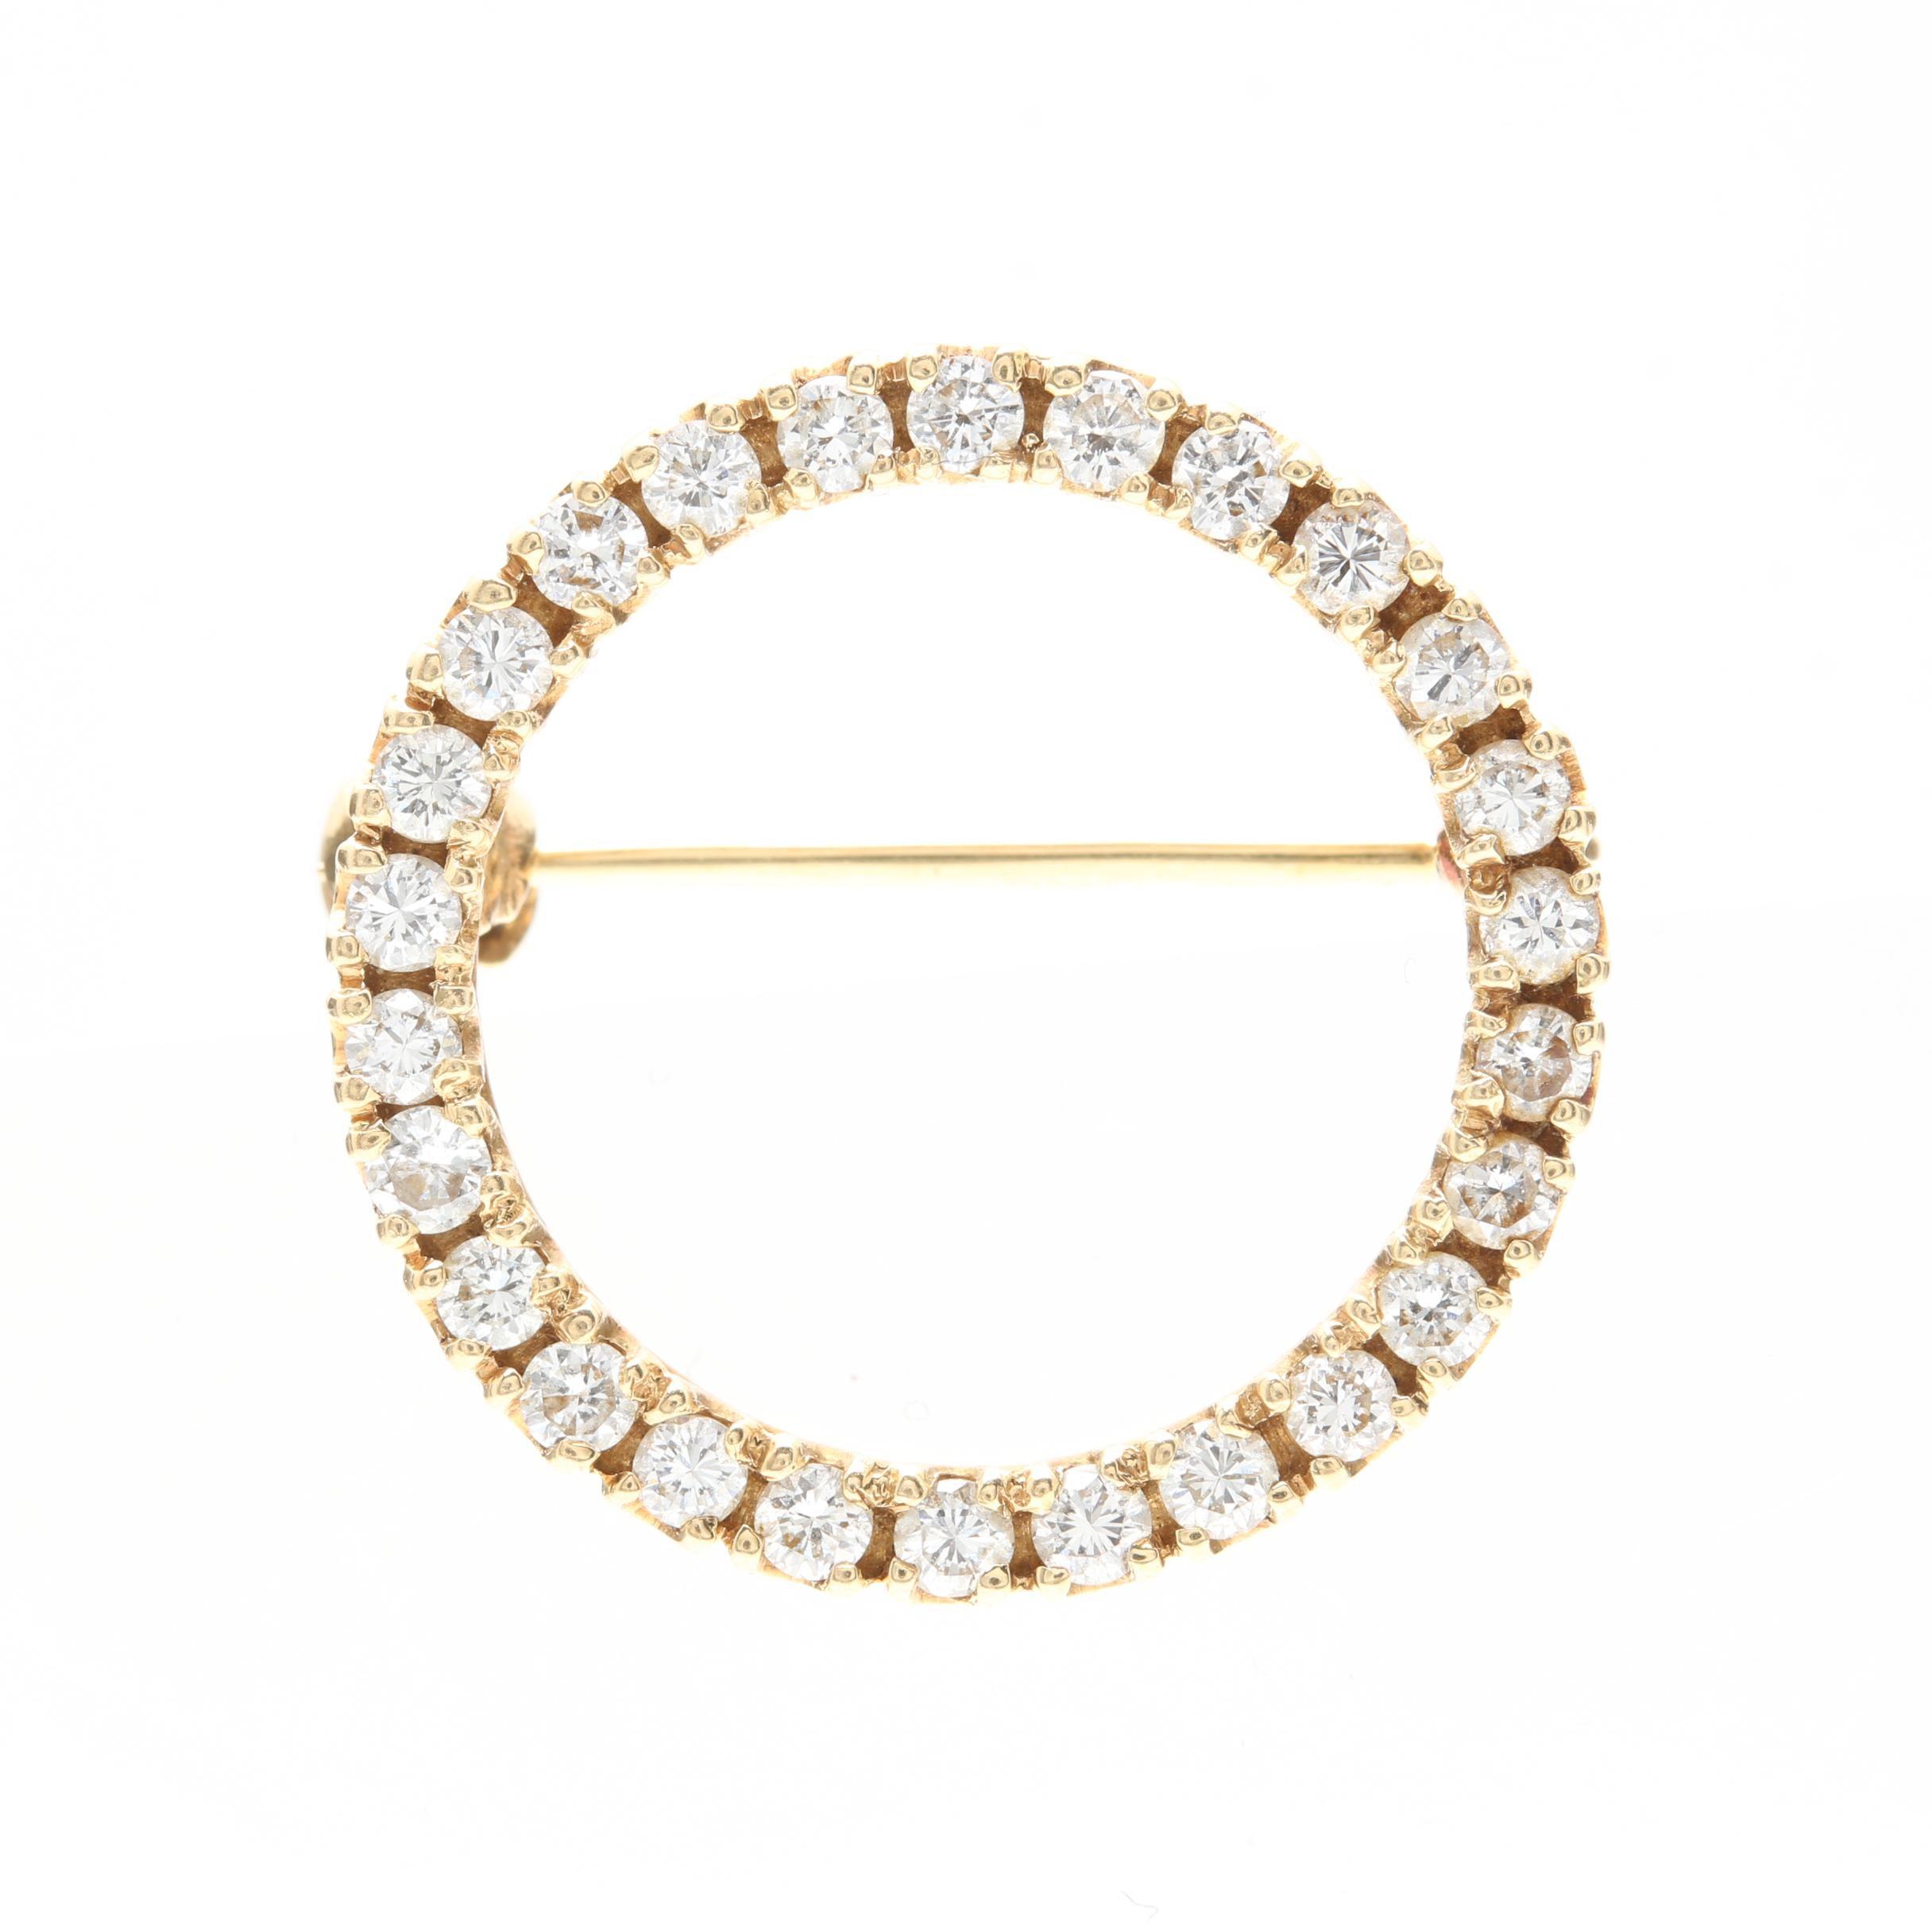 14K Yellow Gold Diamond Brooch